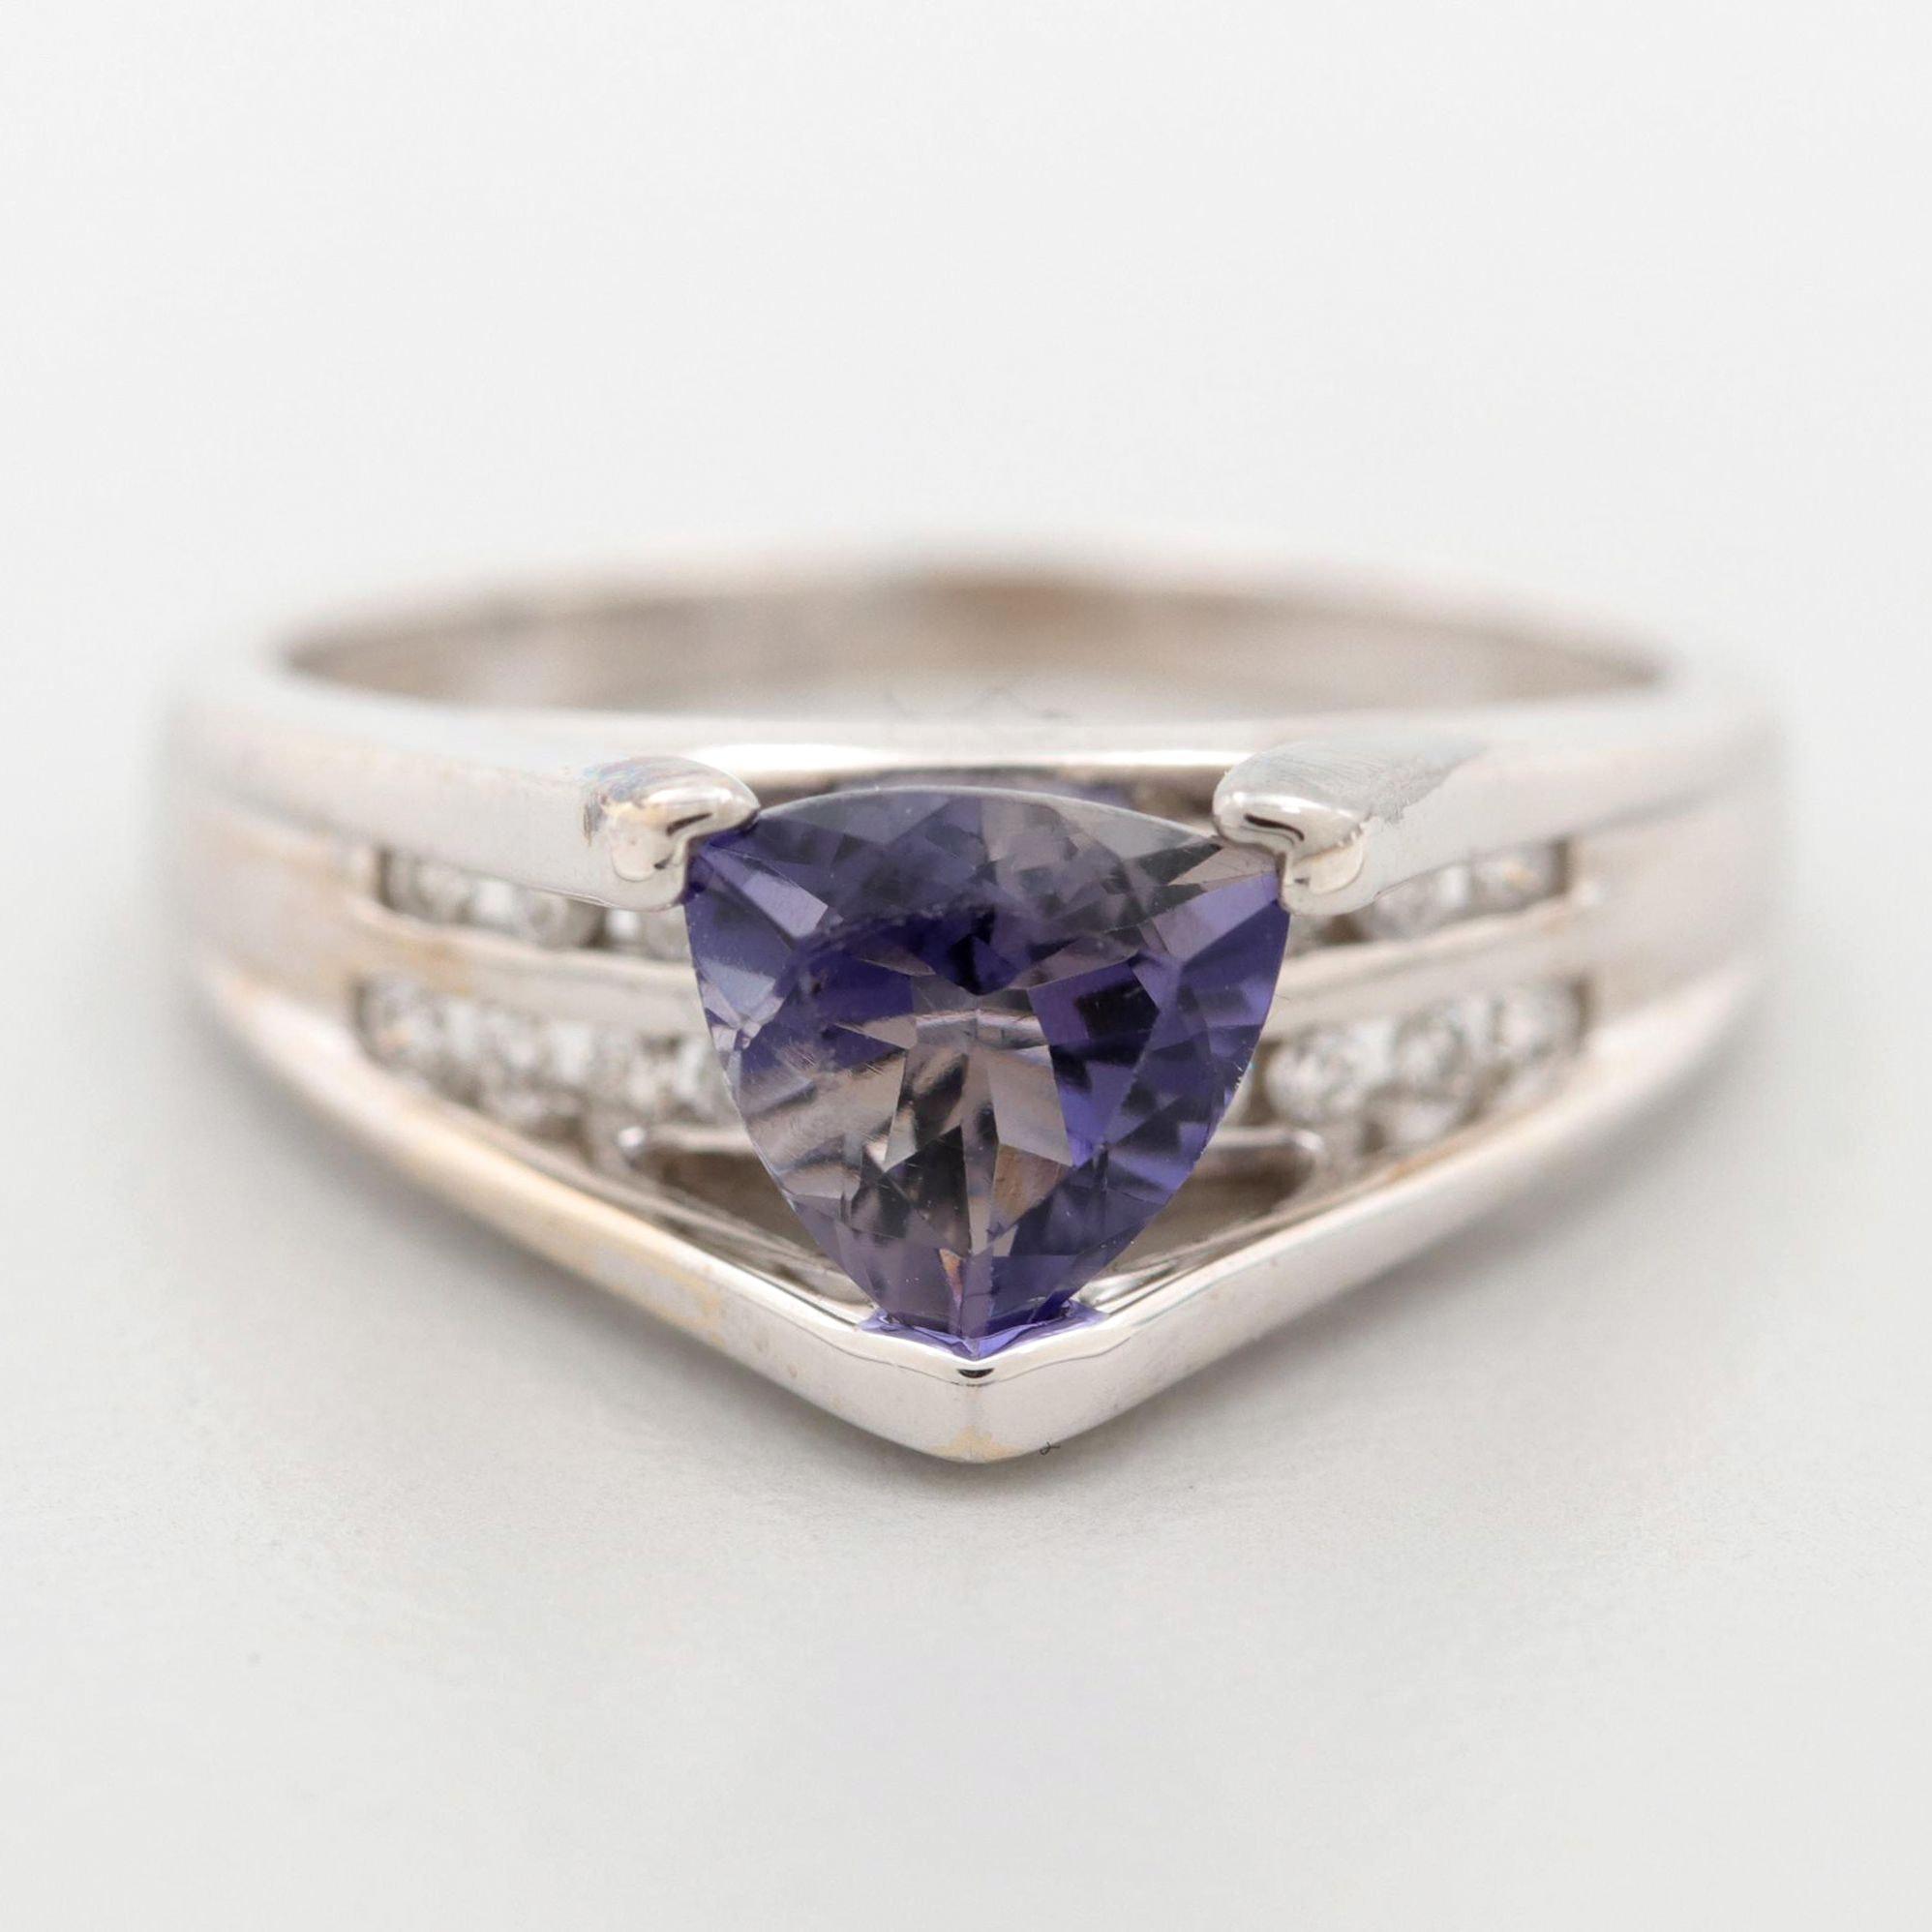 14K White Gold Iolite and Diamond Ring